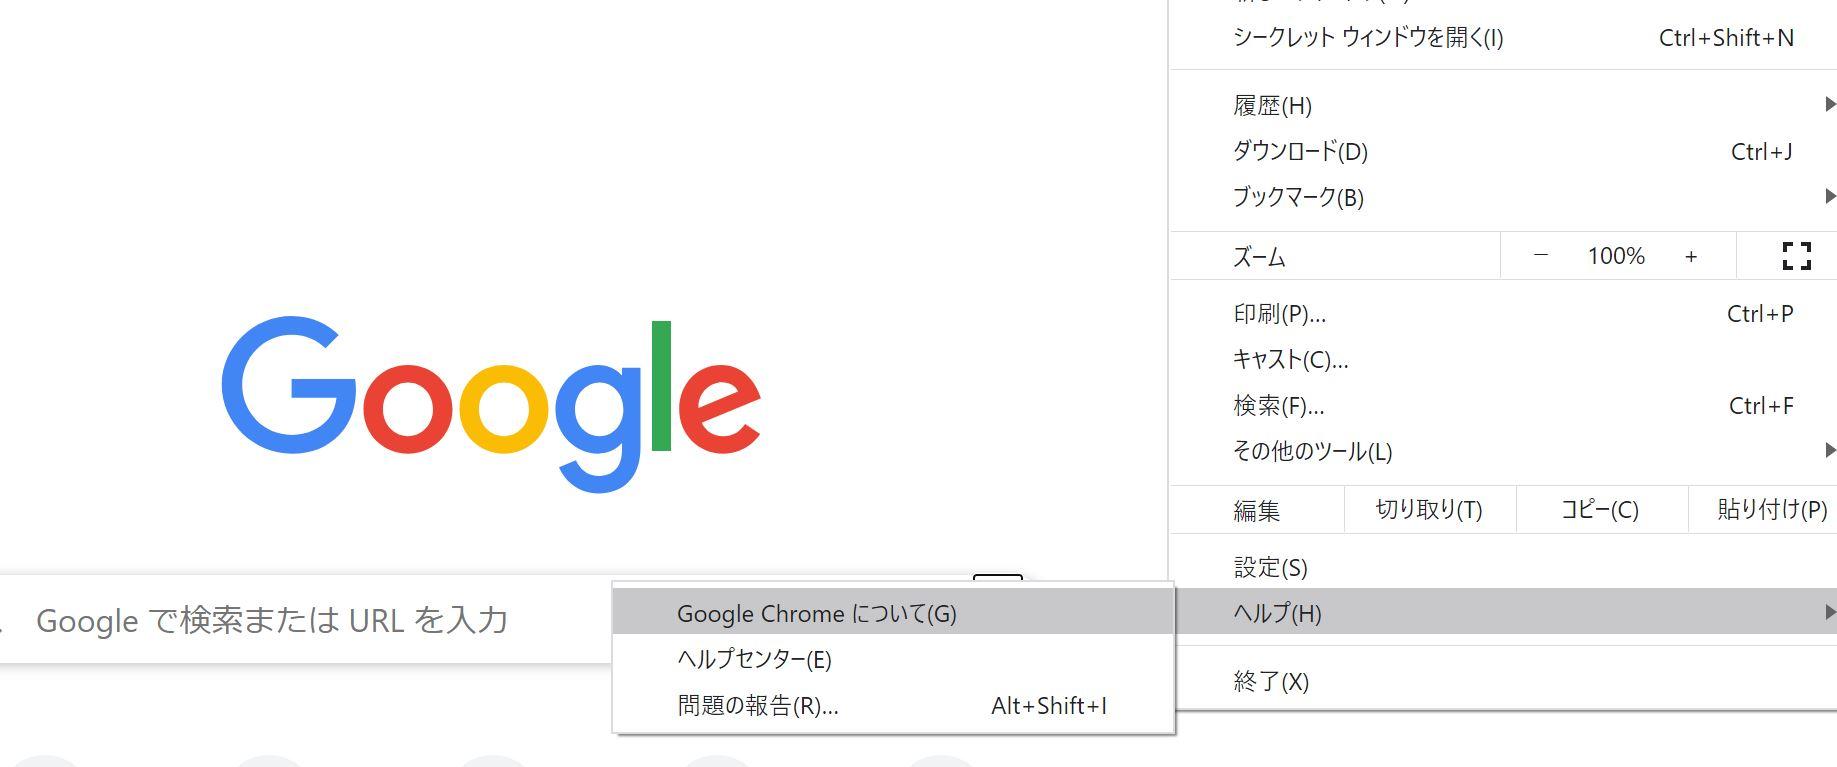 Google Driver